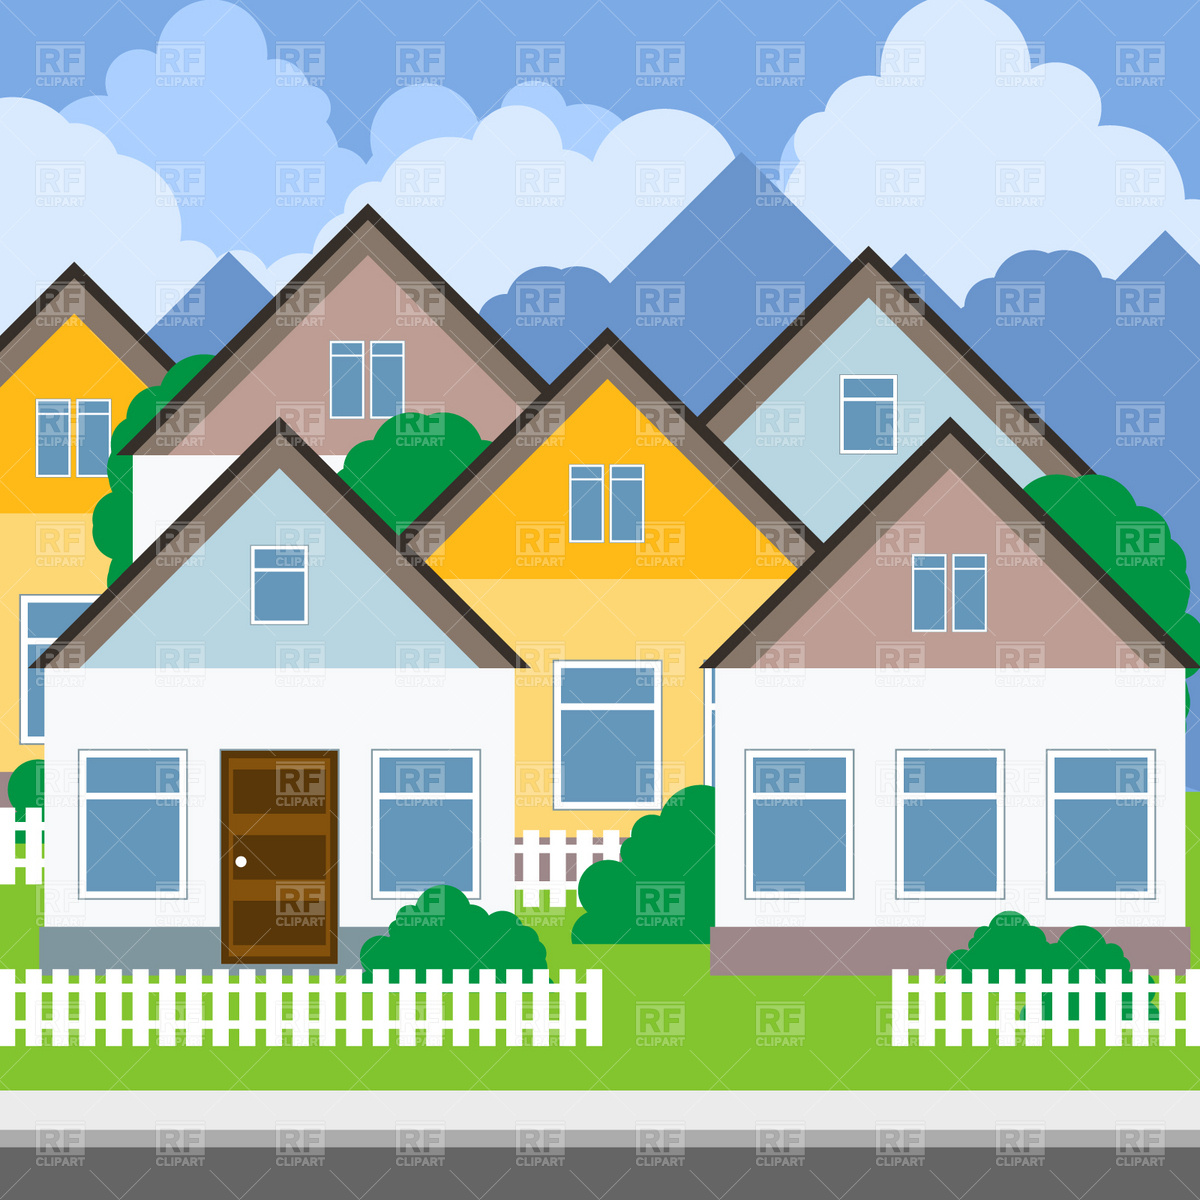 Neighborhood clipart street address. Free town download clip